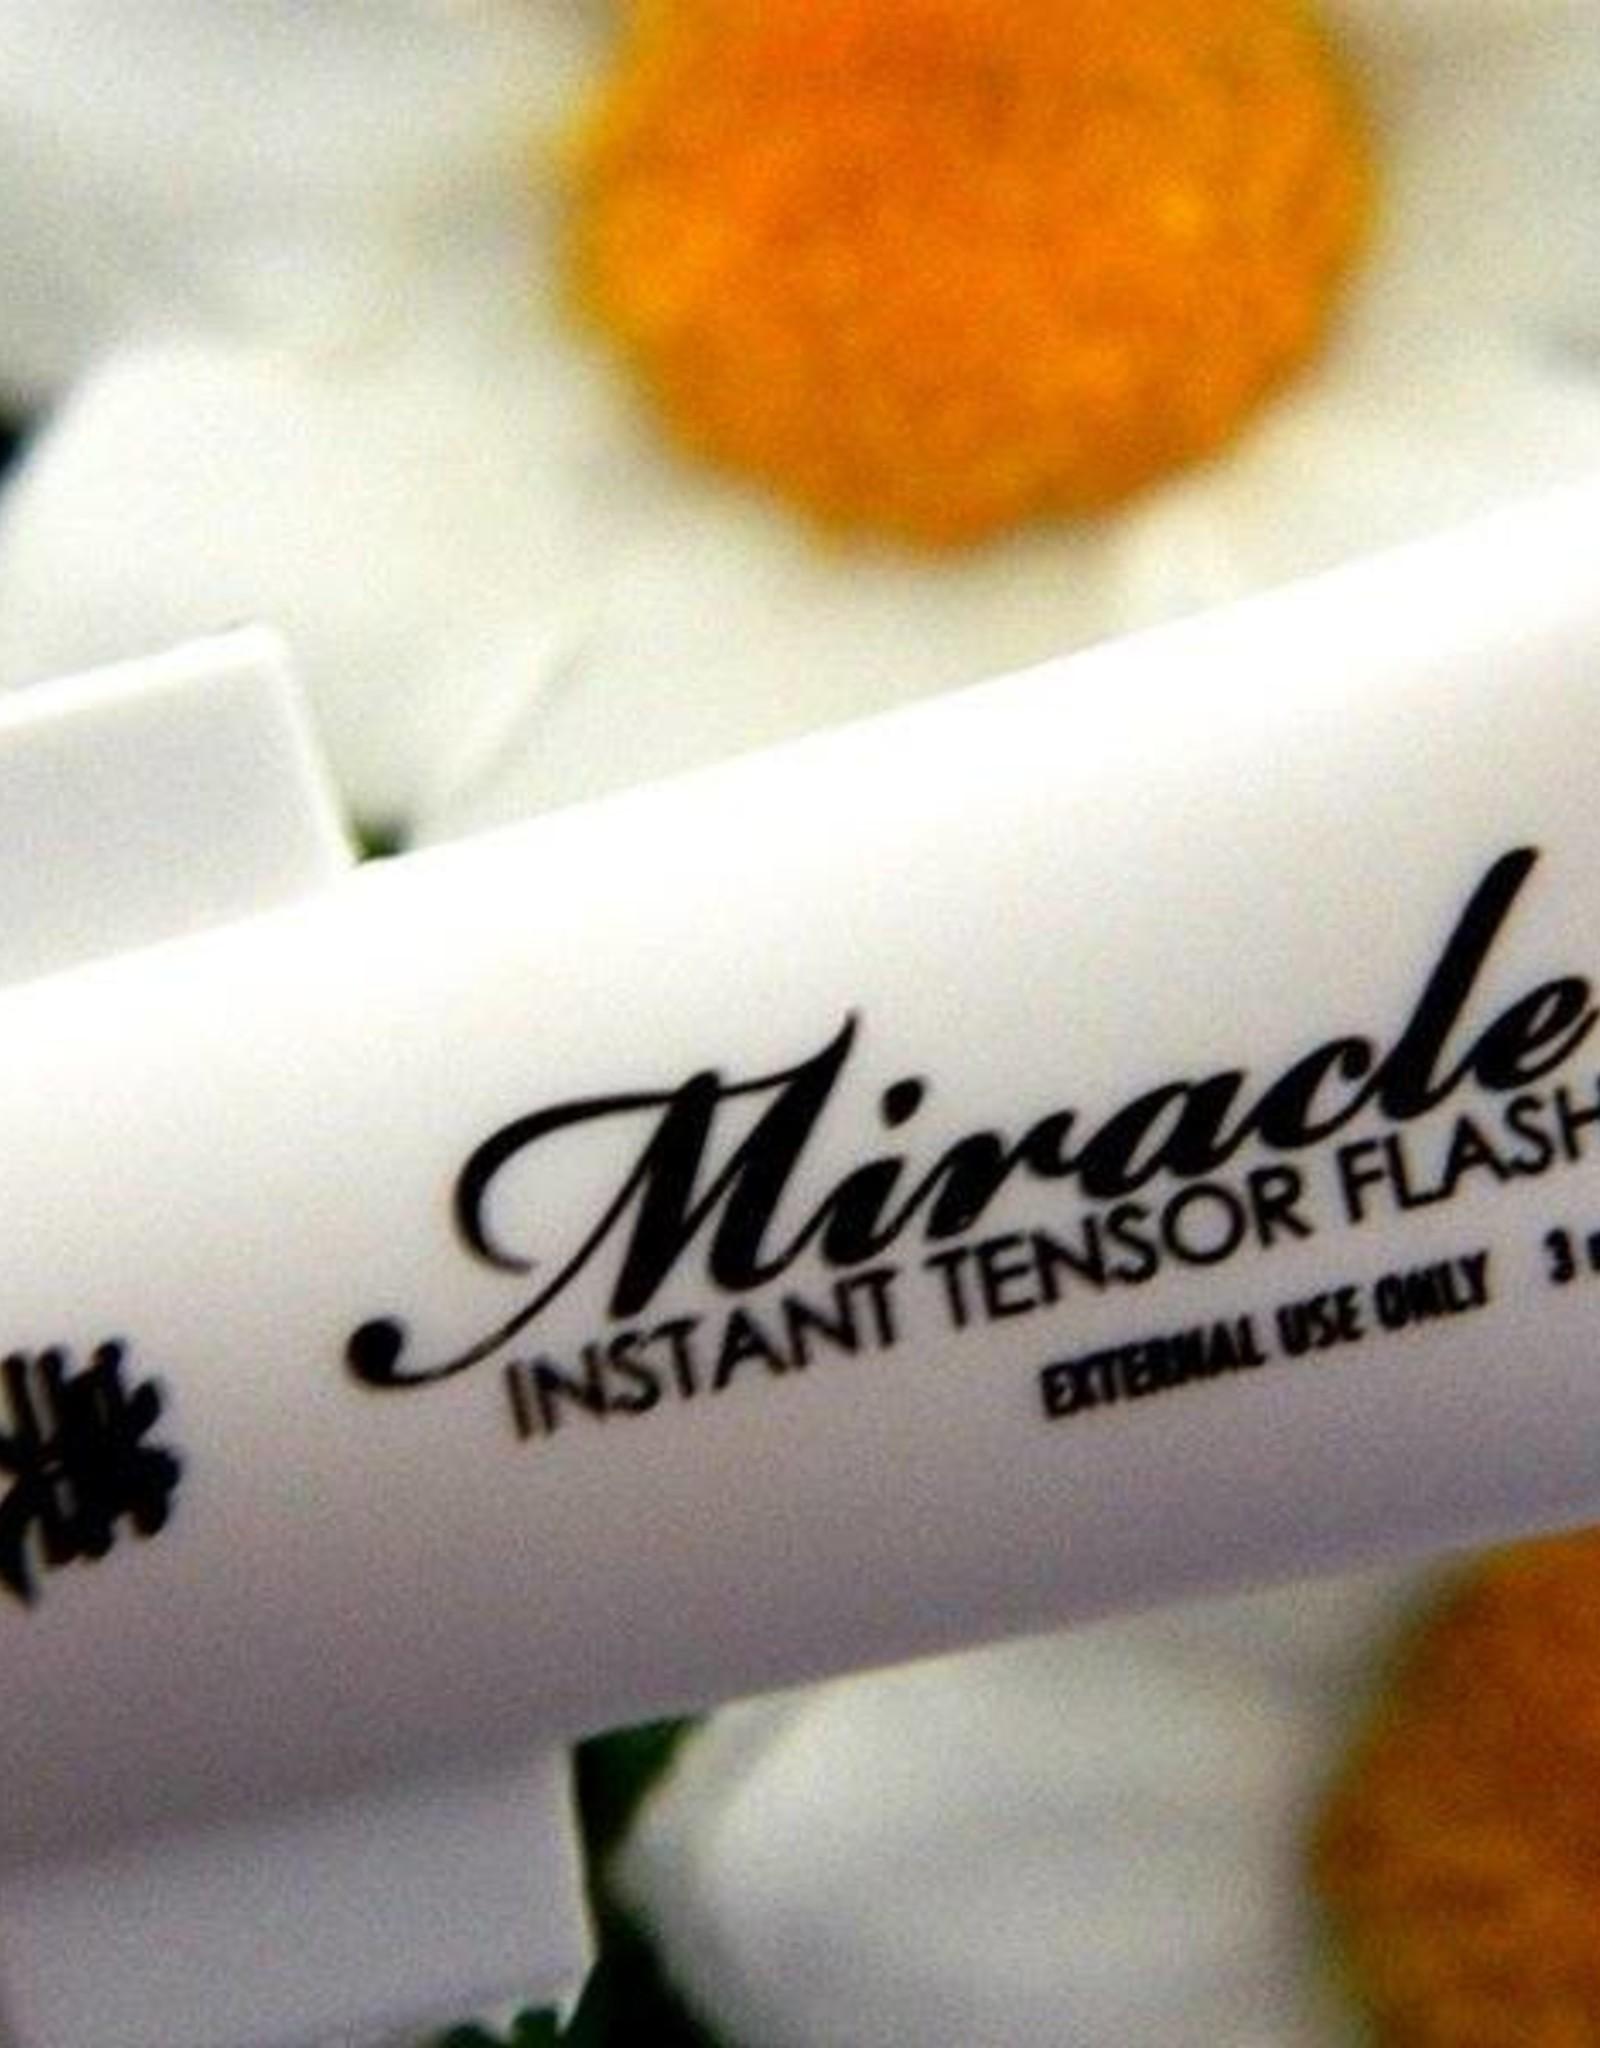 Utsukusy Miracle Instant Tensor Flash single tube